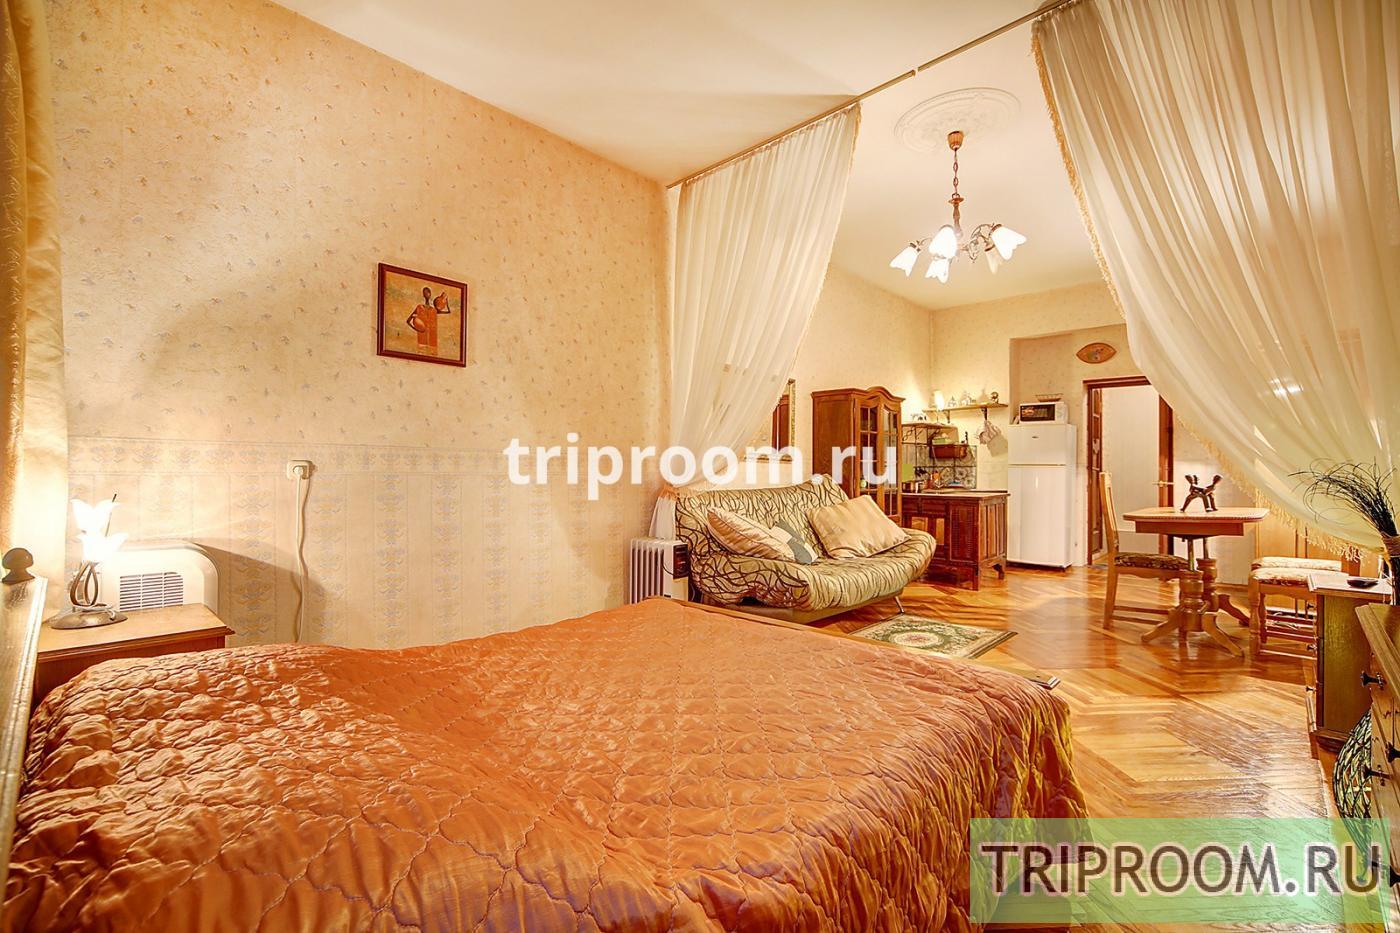 1-комнатная квартира посуточно (вариант № 15445), ул. Лиговский проспект, фото № 5